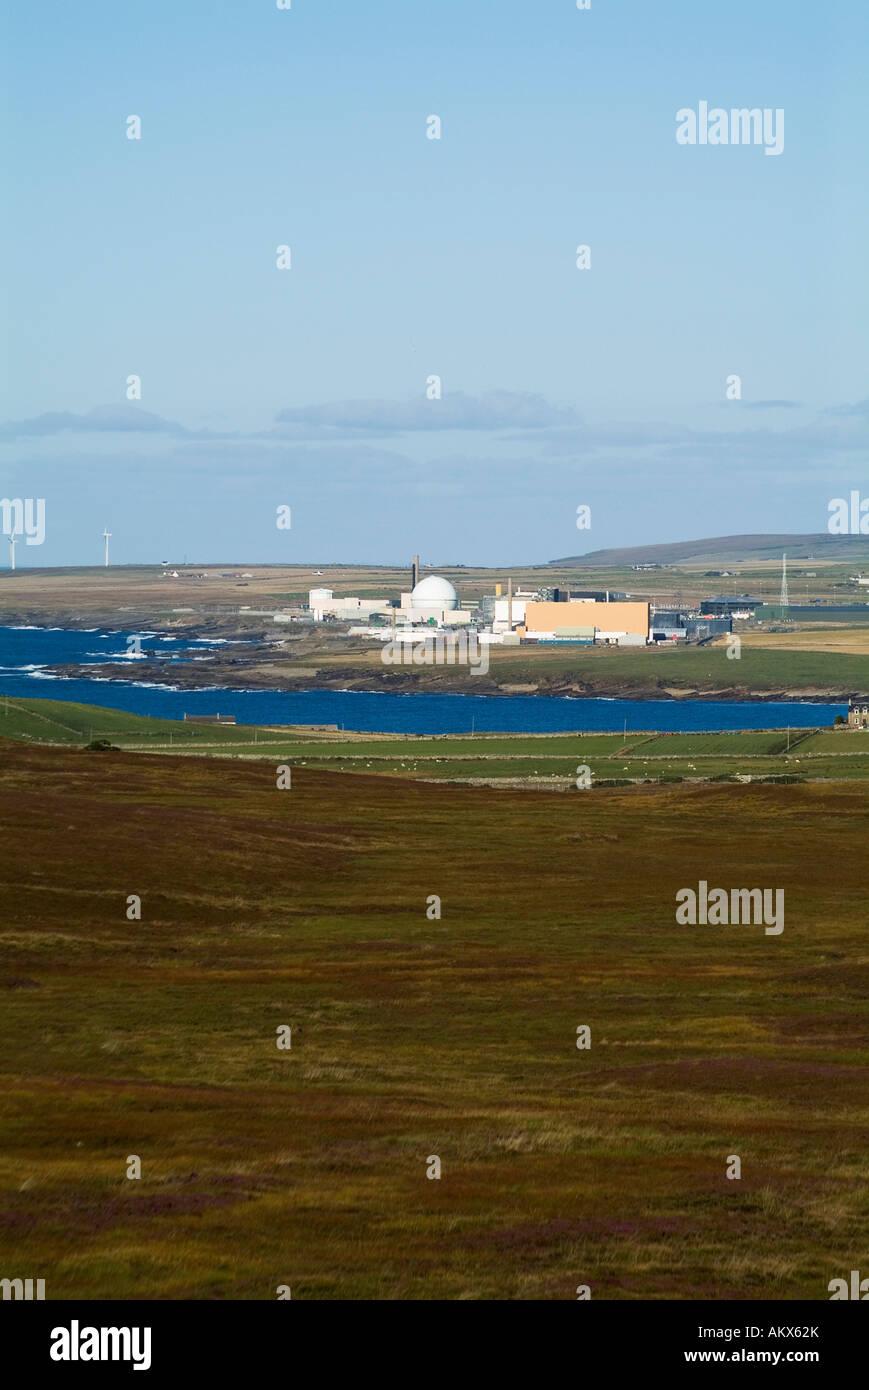 dh  DOUNREAY CAITHNESS Nuclear atomic reactor electricity power station near Thurso scotland - Stock Image